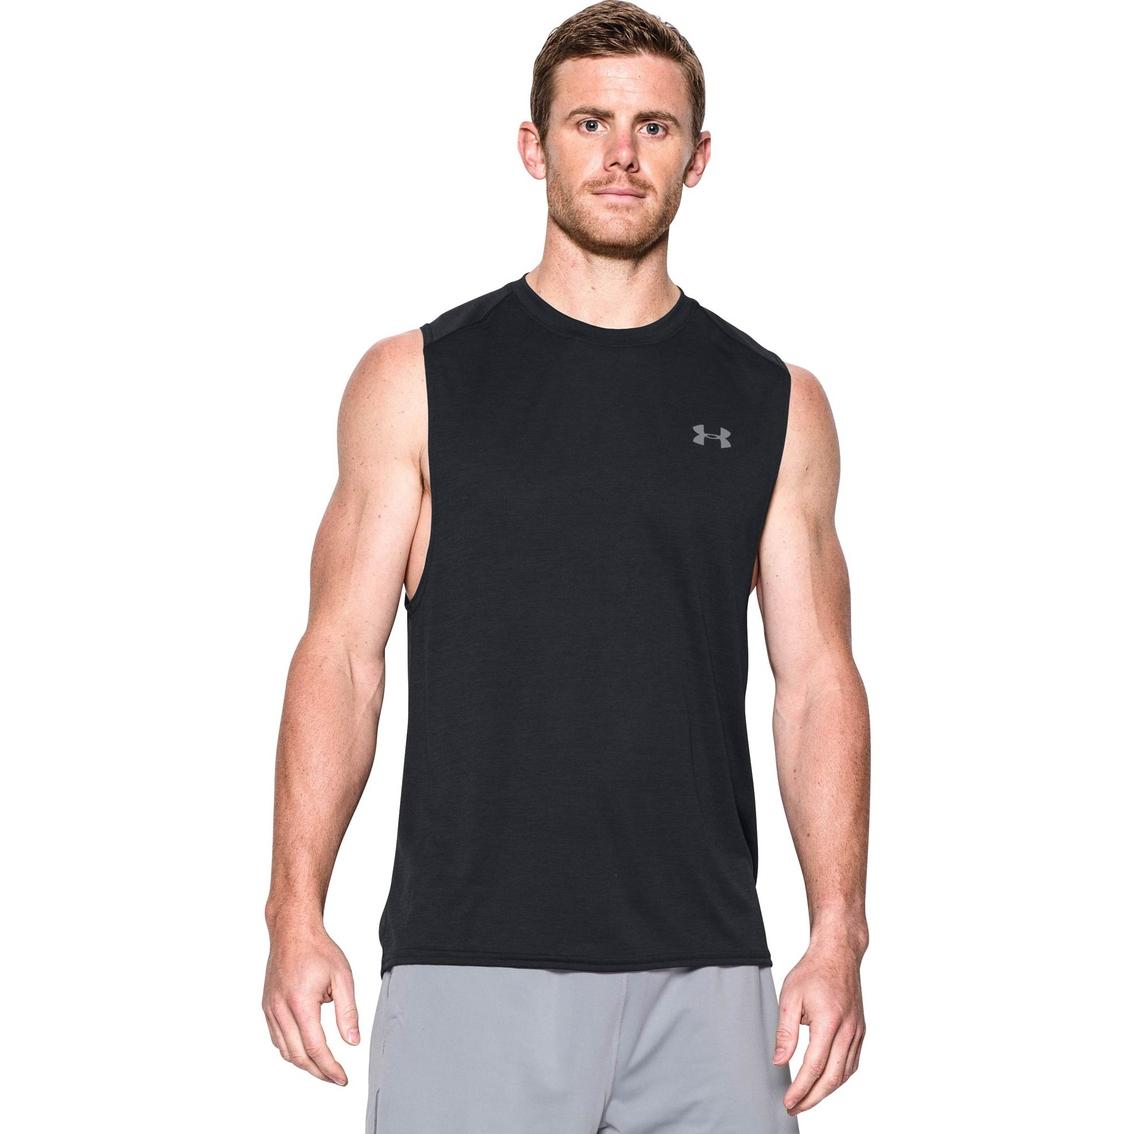 de184e620d3c95 Under armour ua tech muscle tank shirts apparel shop jpg 1134x1134 Under  armour muscle tank